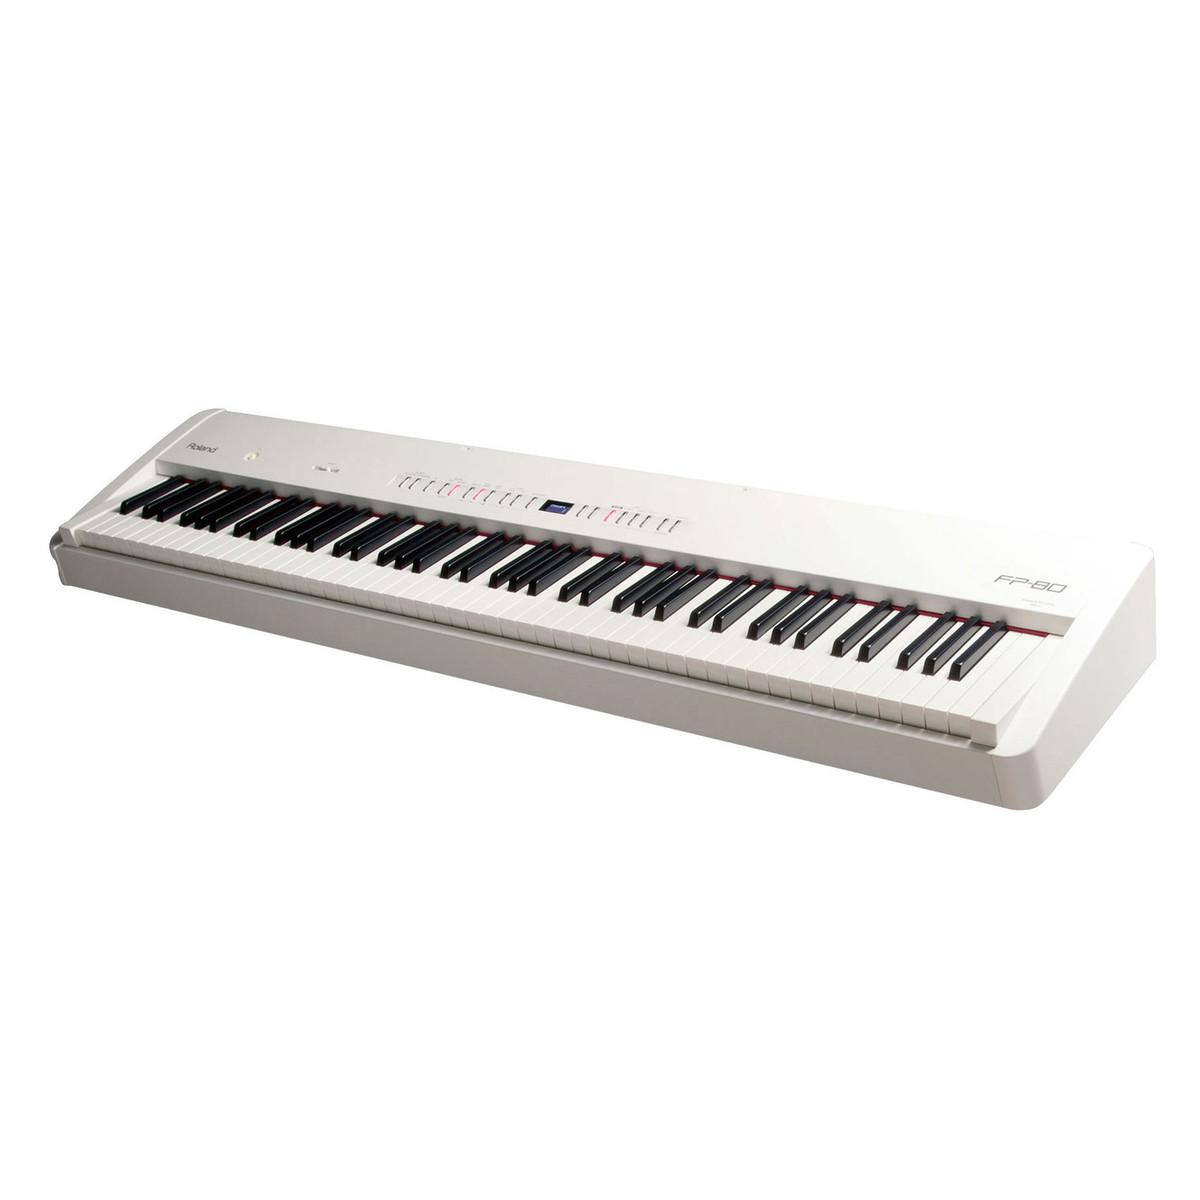 roland fp 80 supernatural digital piano white box opened at. Black Bedroom Furniture Sets. Home Design Ideas